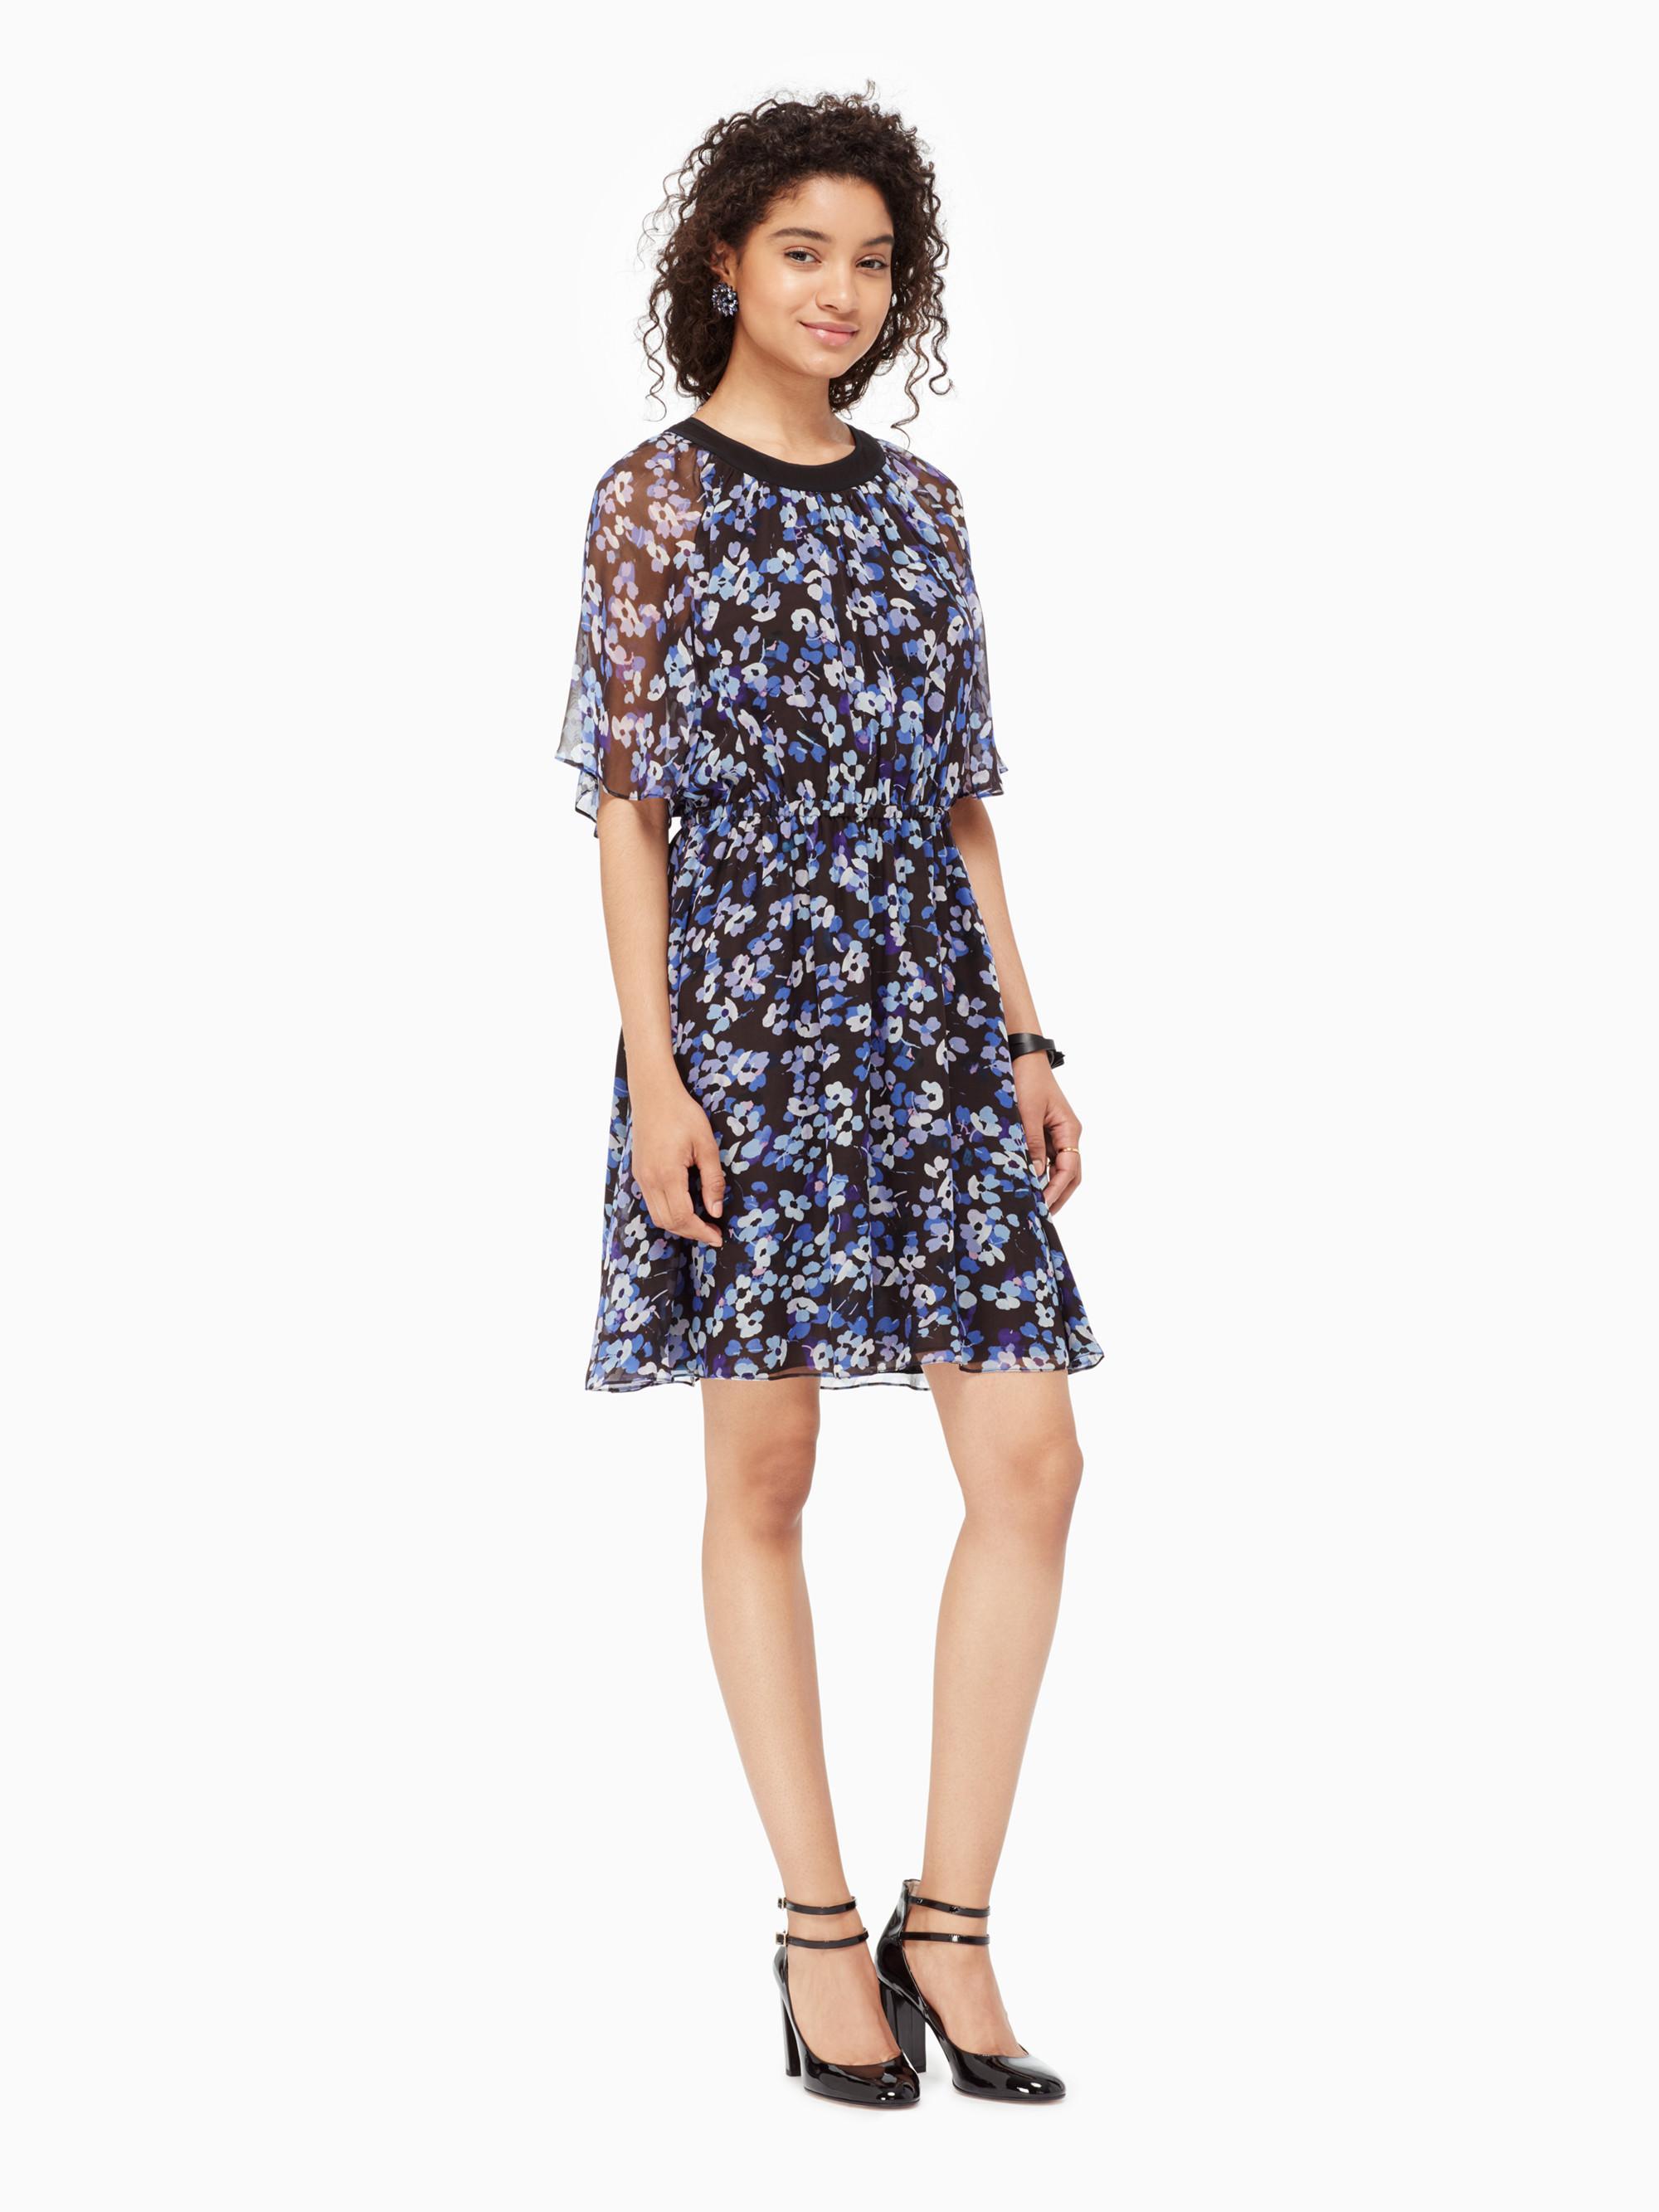 3ceb1771da497 Kate Spade Hydrangea Chiffon Dress in Black - Lyst